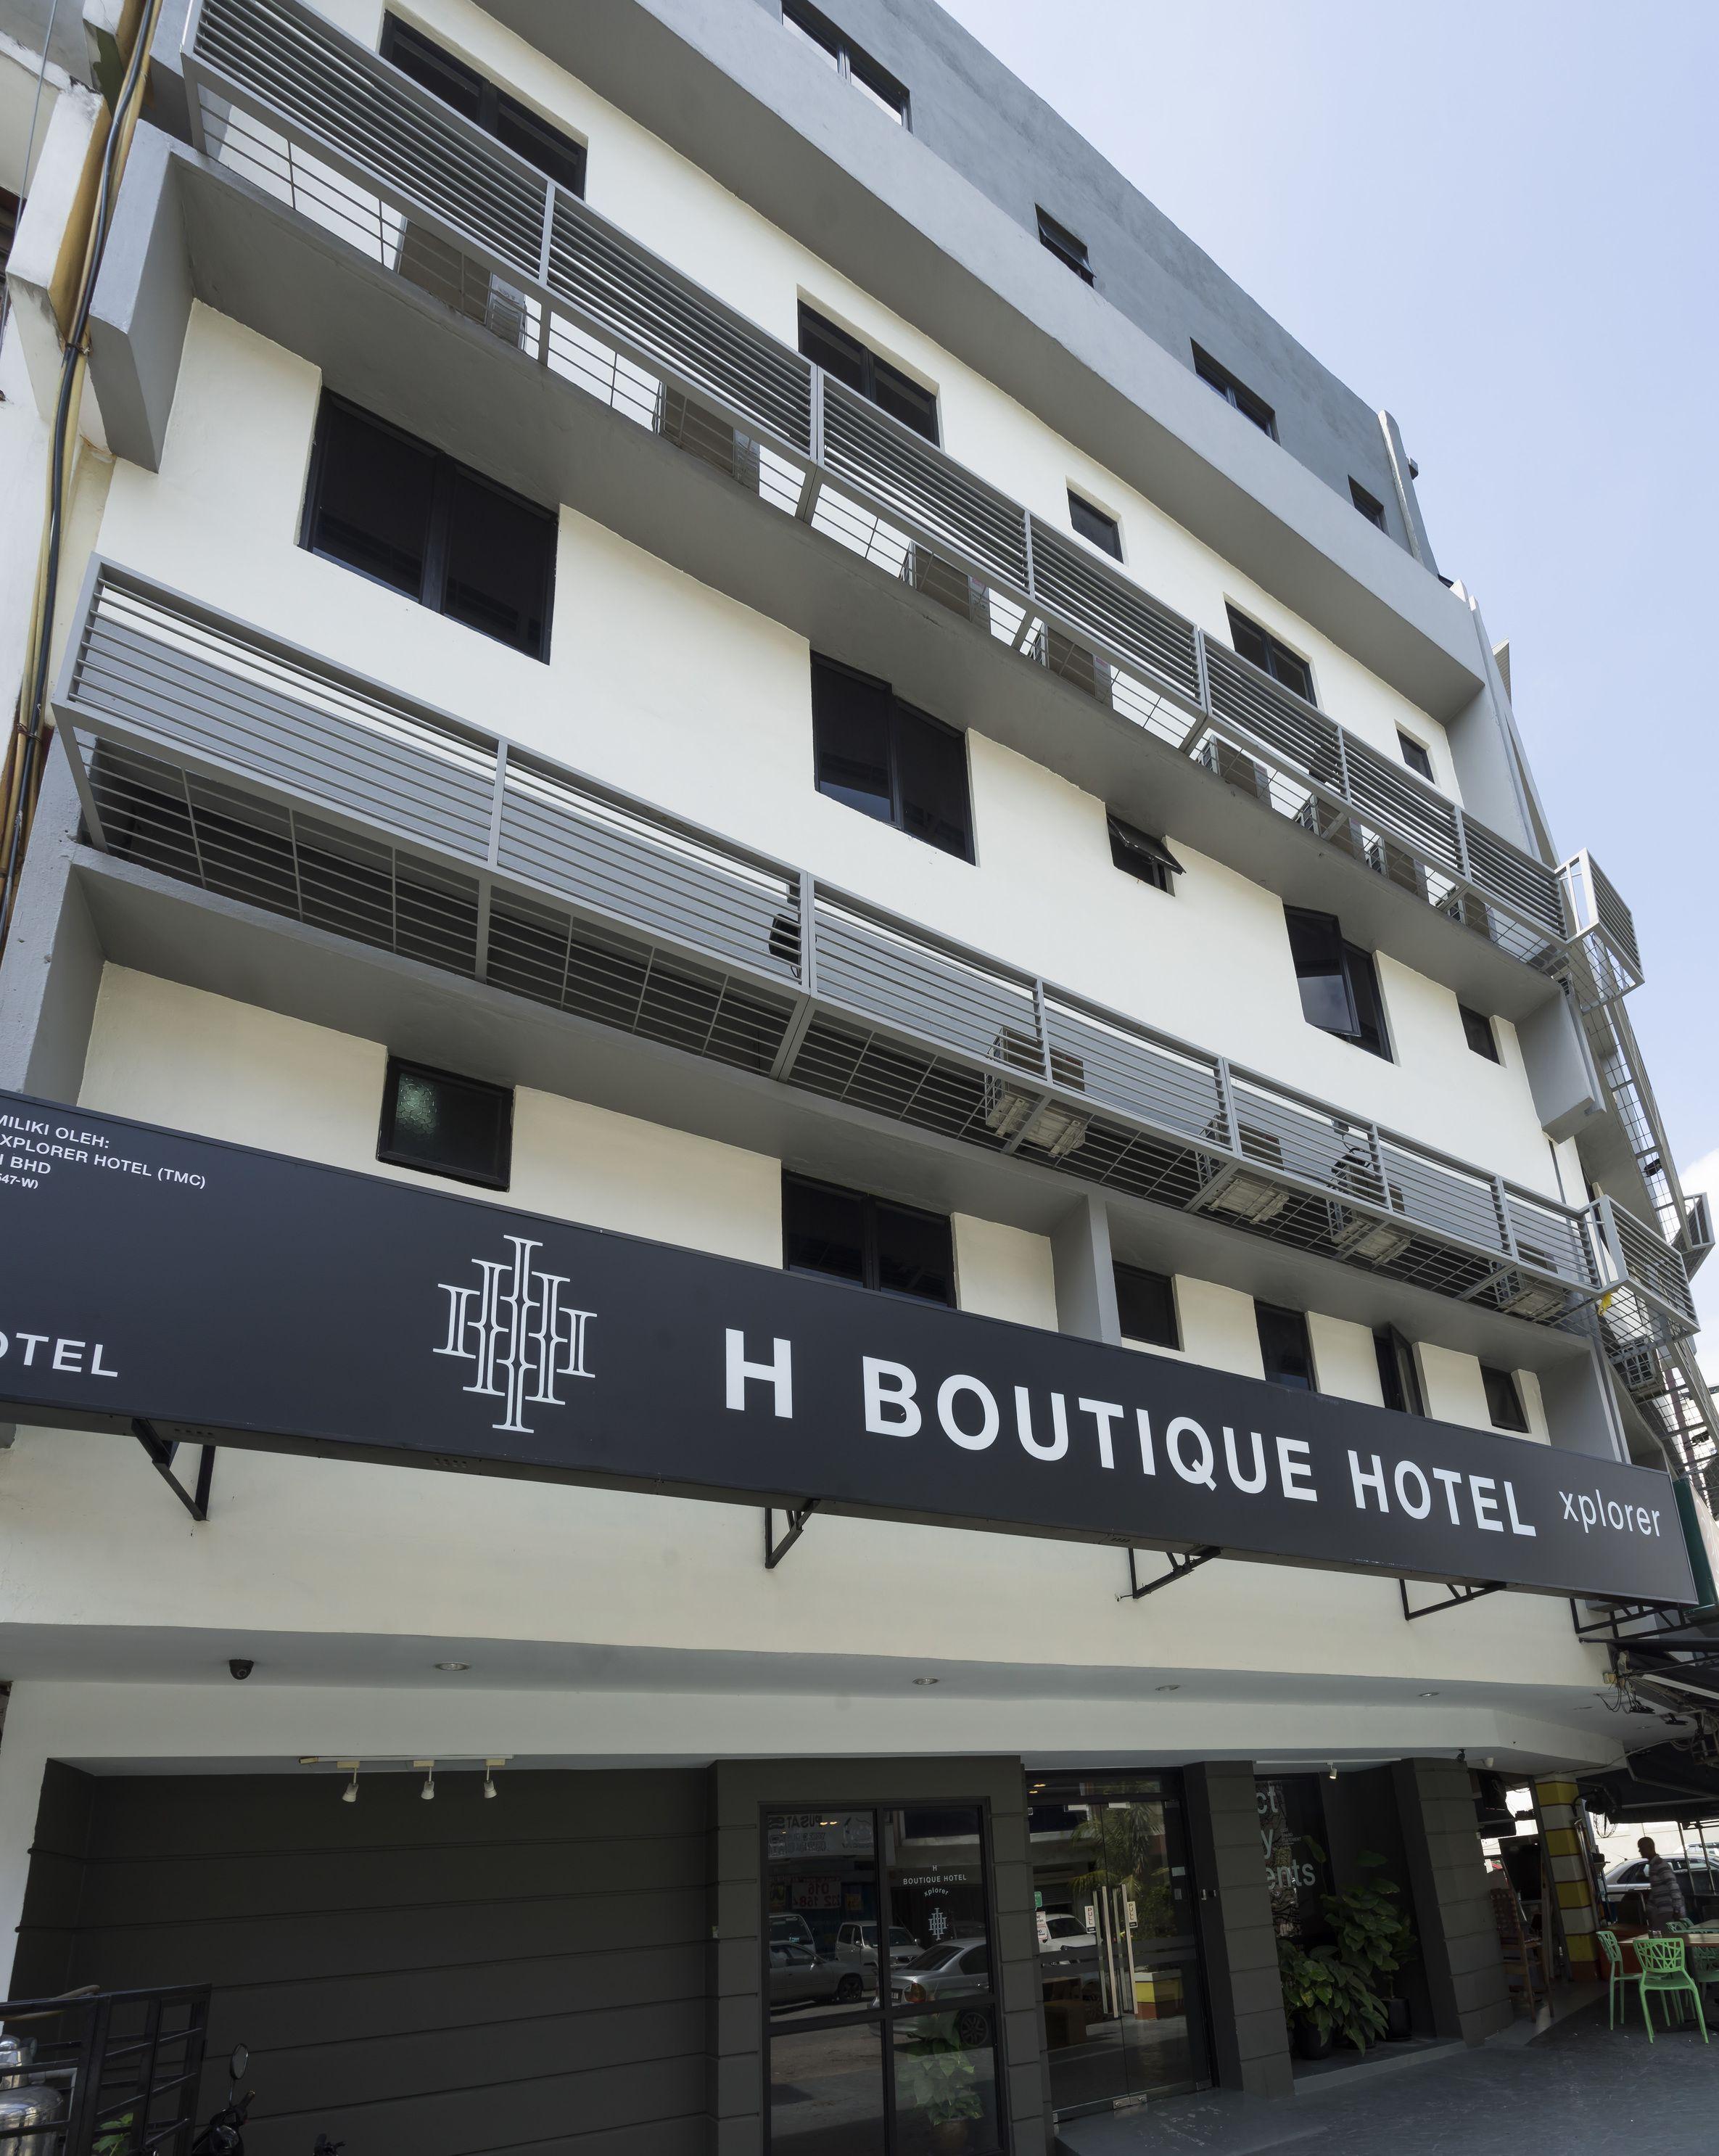 H Boutique Hotel Xplorer Maluri Cheras,KAMPONG PANDAN LUAR